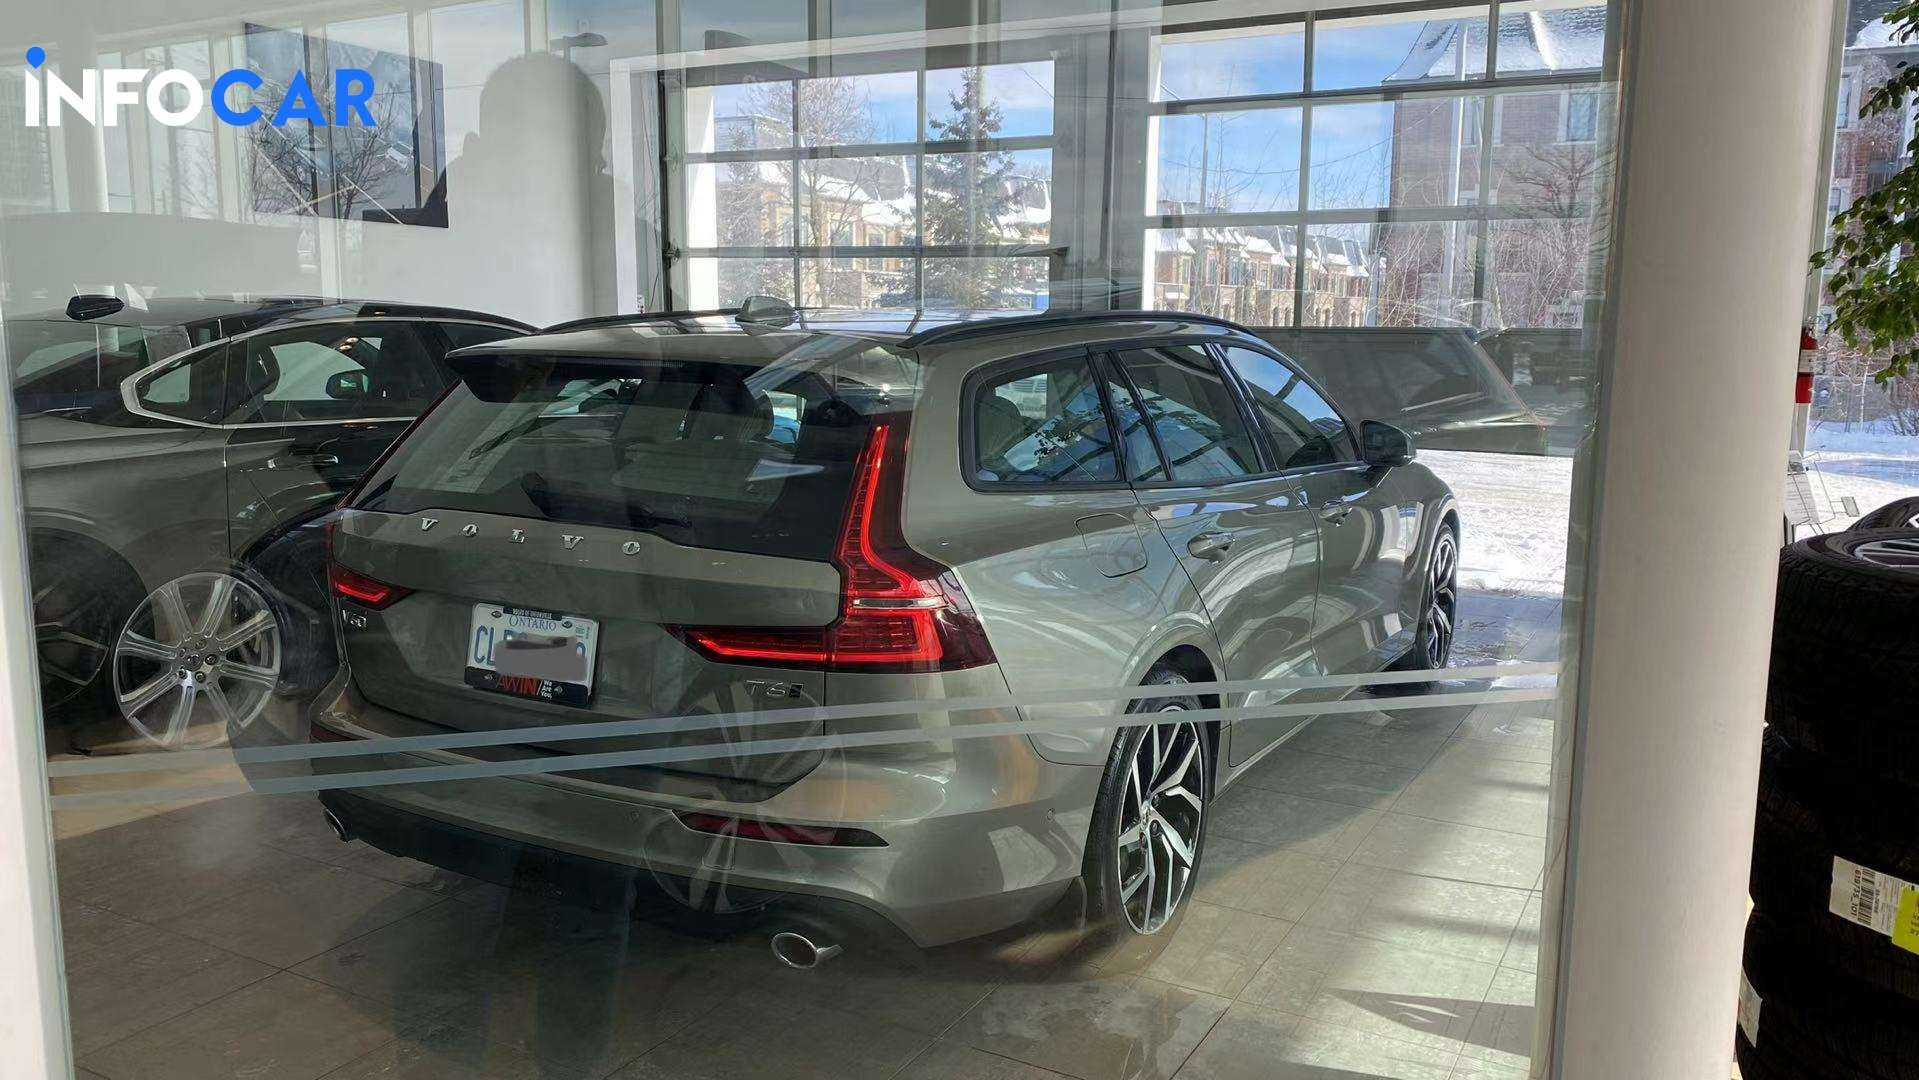 2019 Volvo V60 T6 AWD - INFOCAR - Toronto's Most Comprehensive New and Used Auto Trading Platform